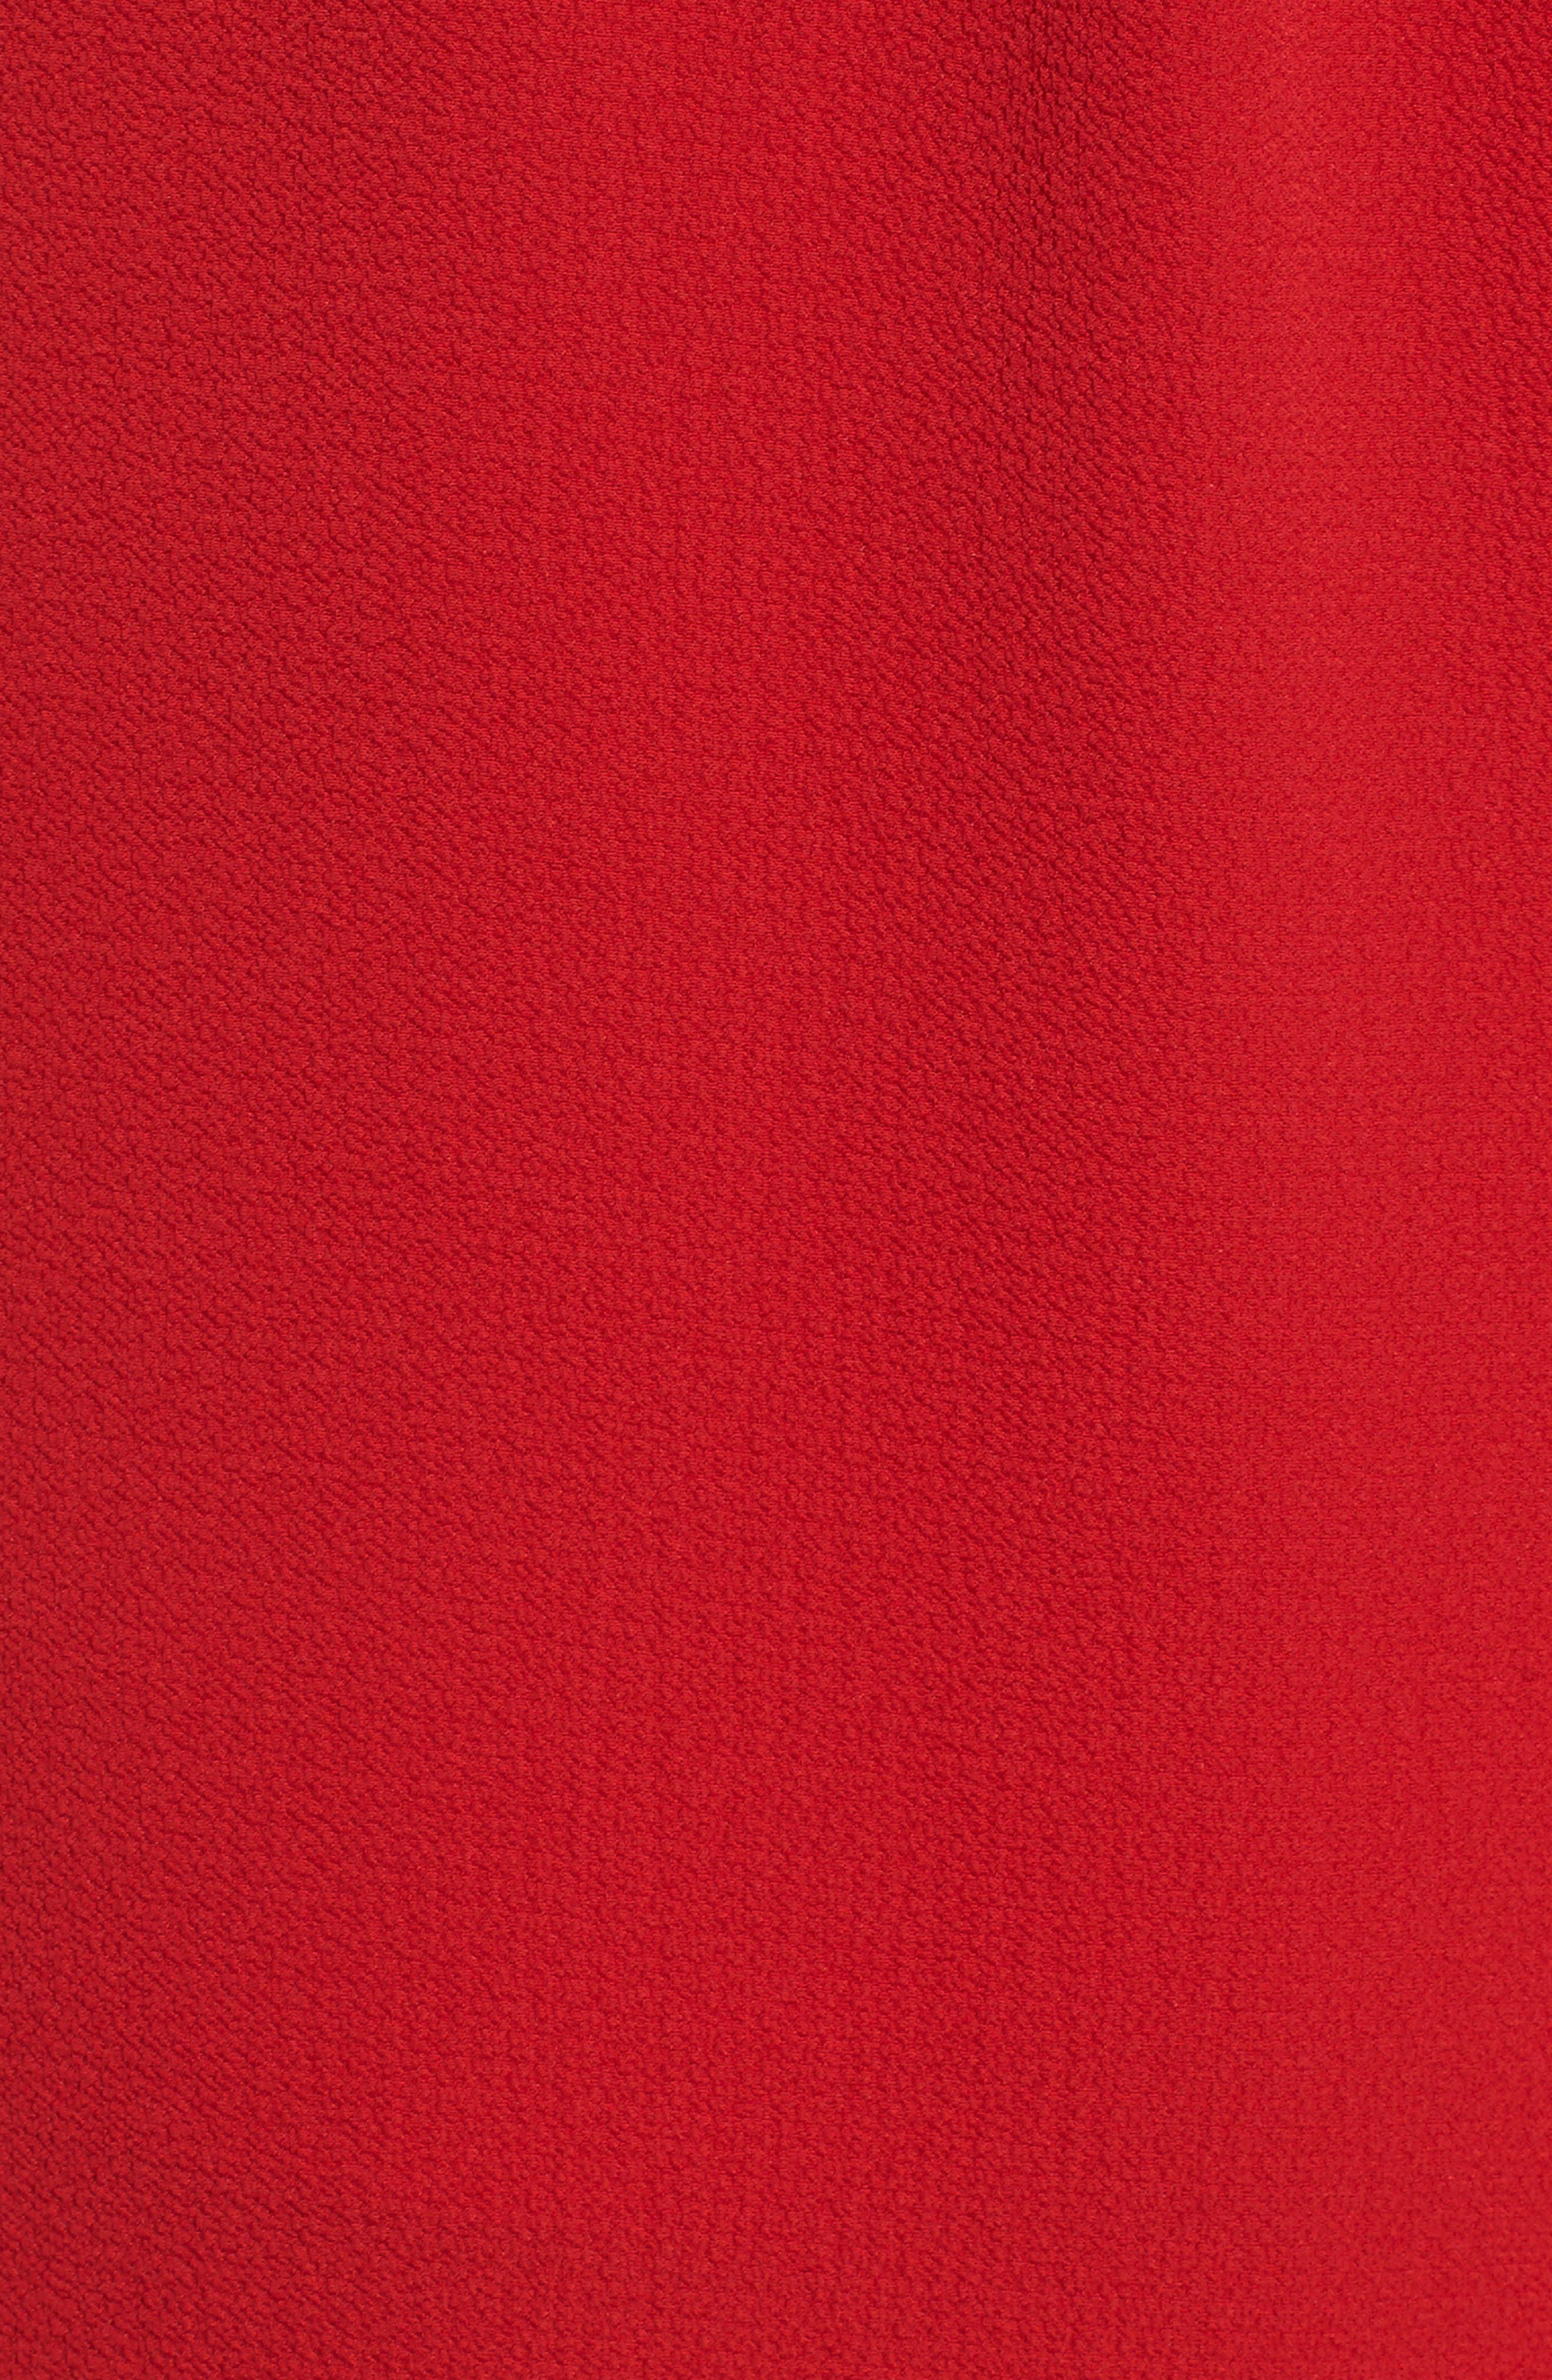 Cinch Front Crop Jumpsuit,                             Alternate thumbnail 6, color,                             RED LIPSTICK